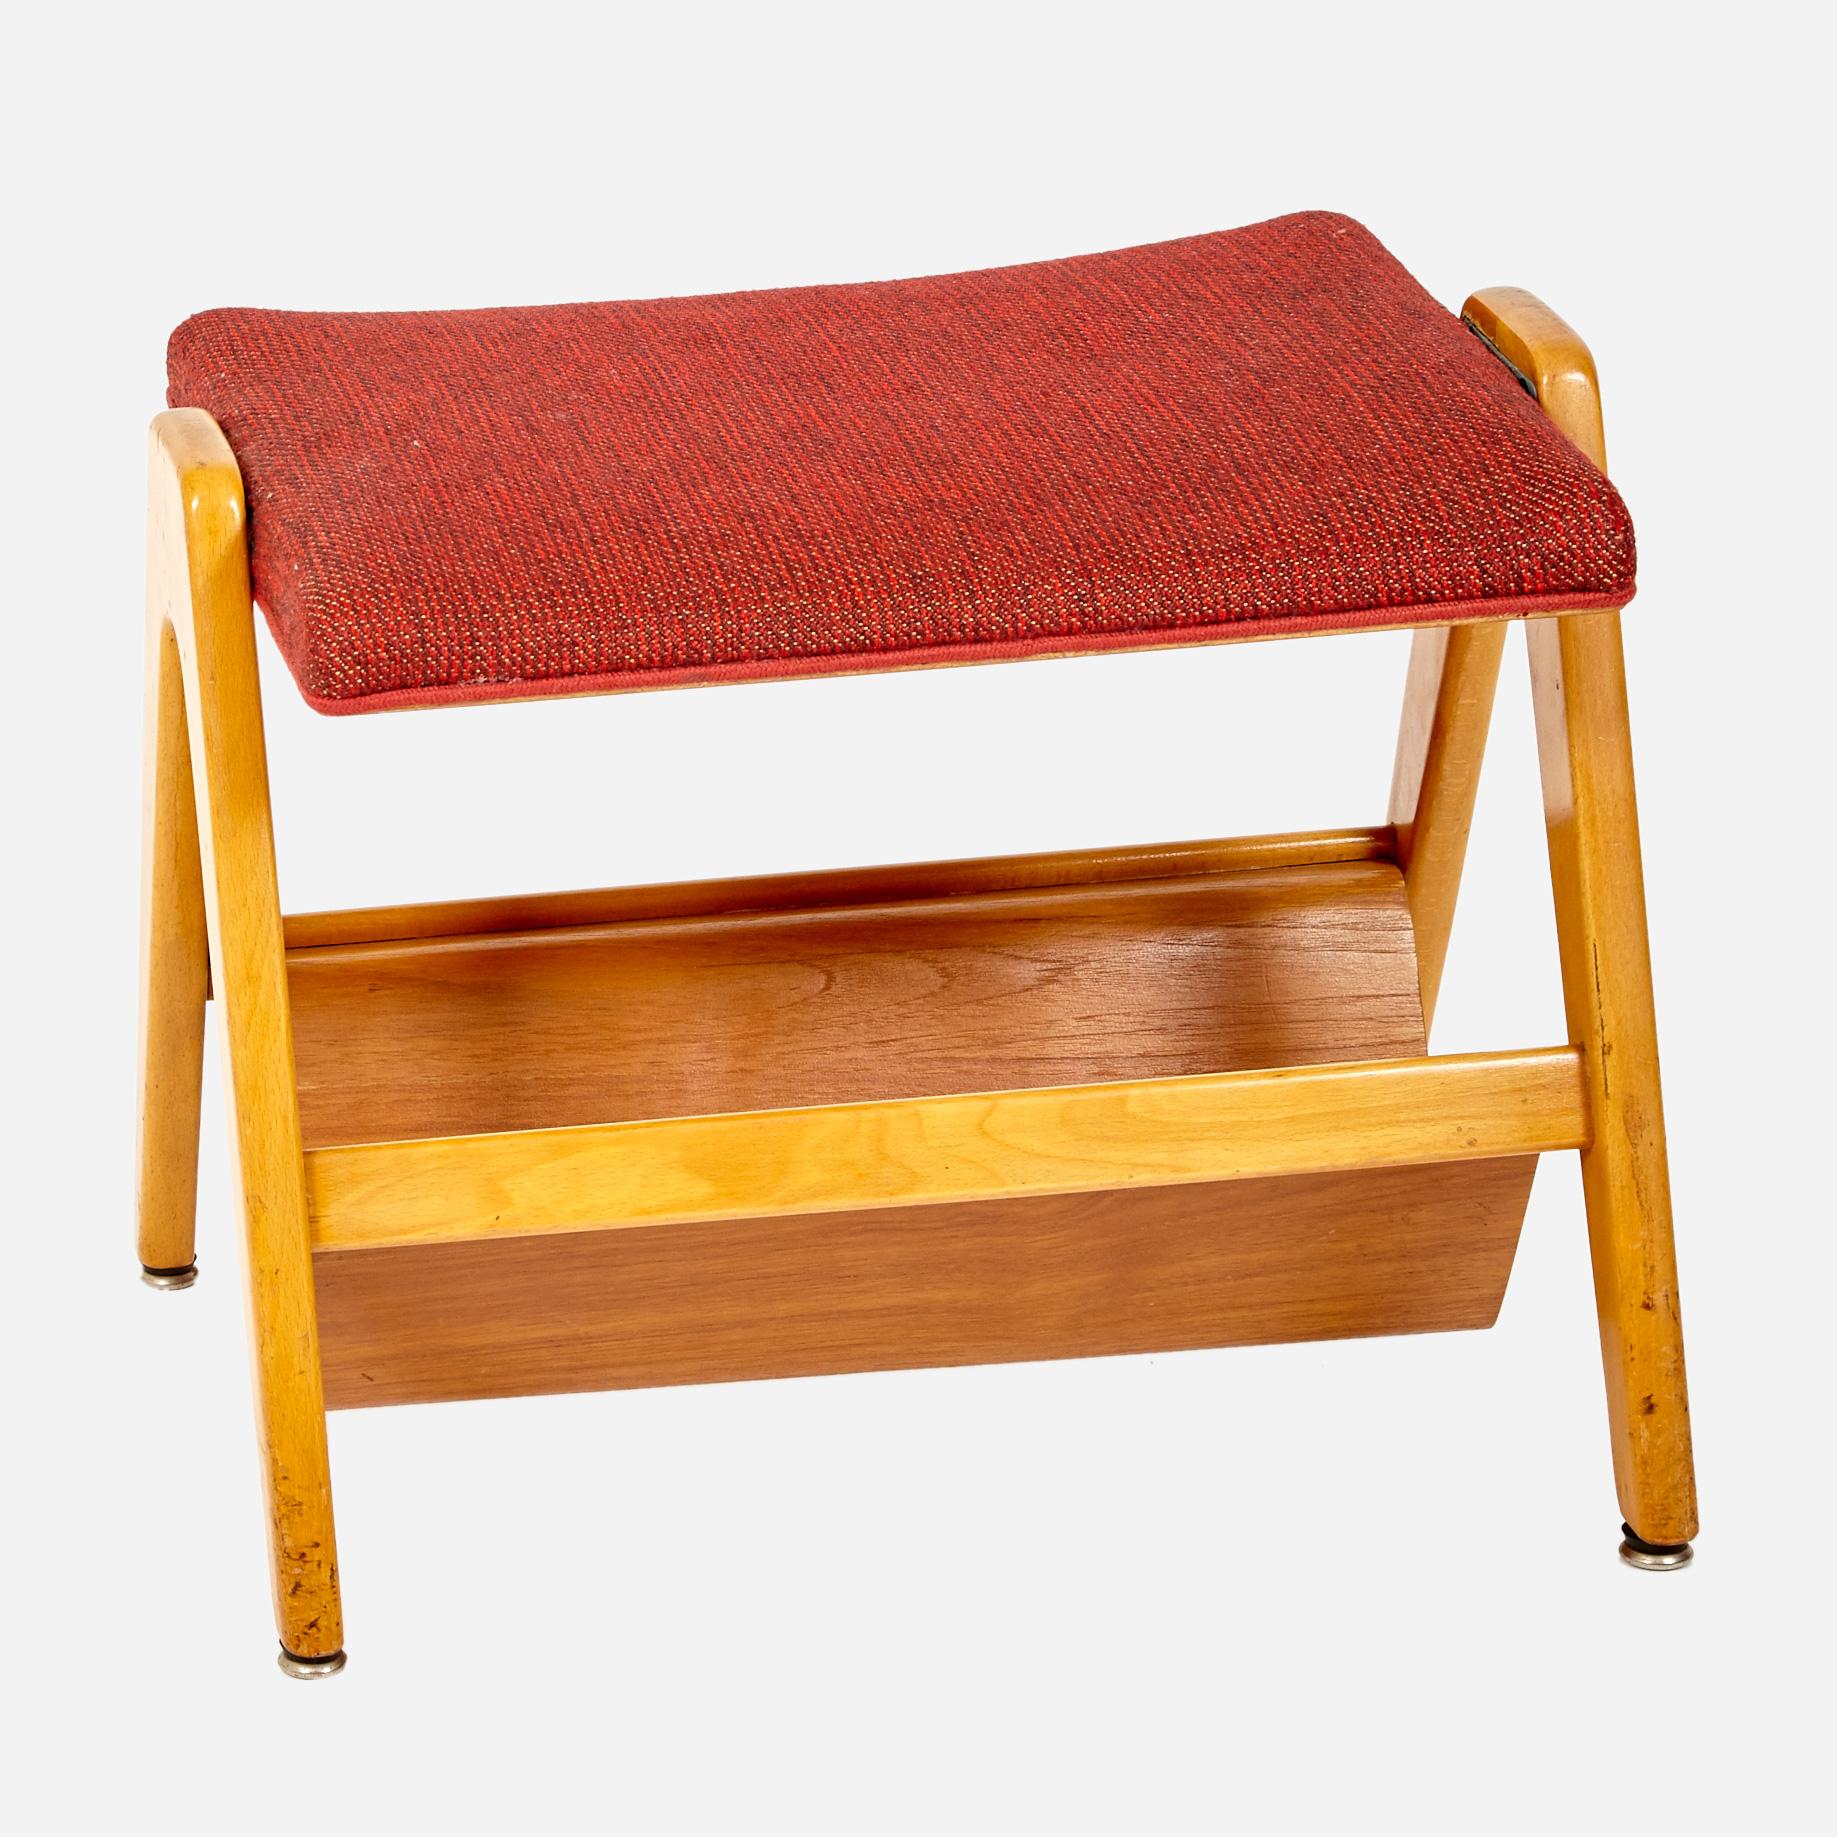 fussb ckli mit zeitschriftenablage m bel z rich vintagem bel. Black Bedroom Furniture Sets. Home Design Ideas